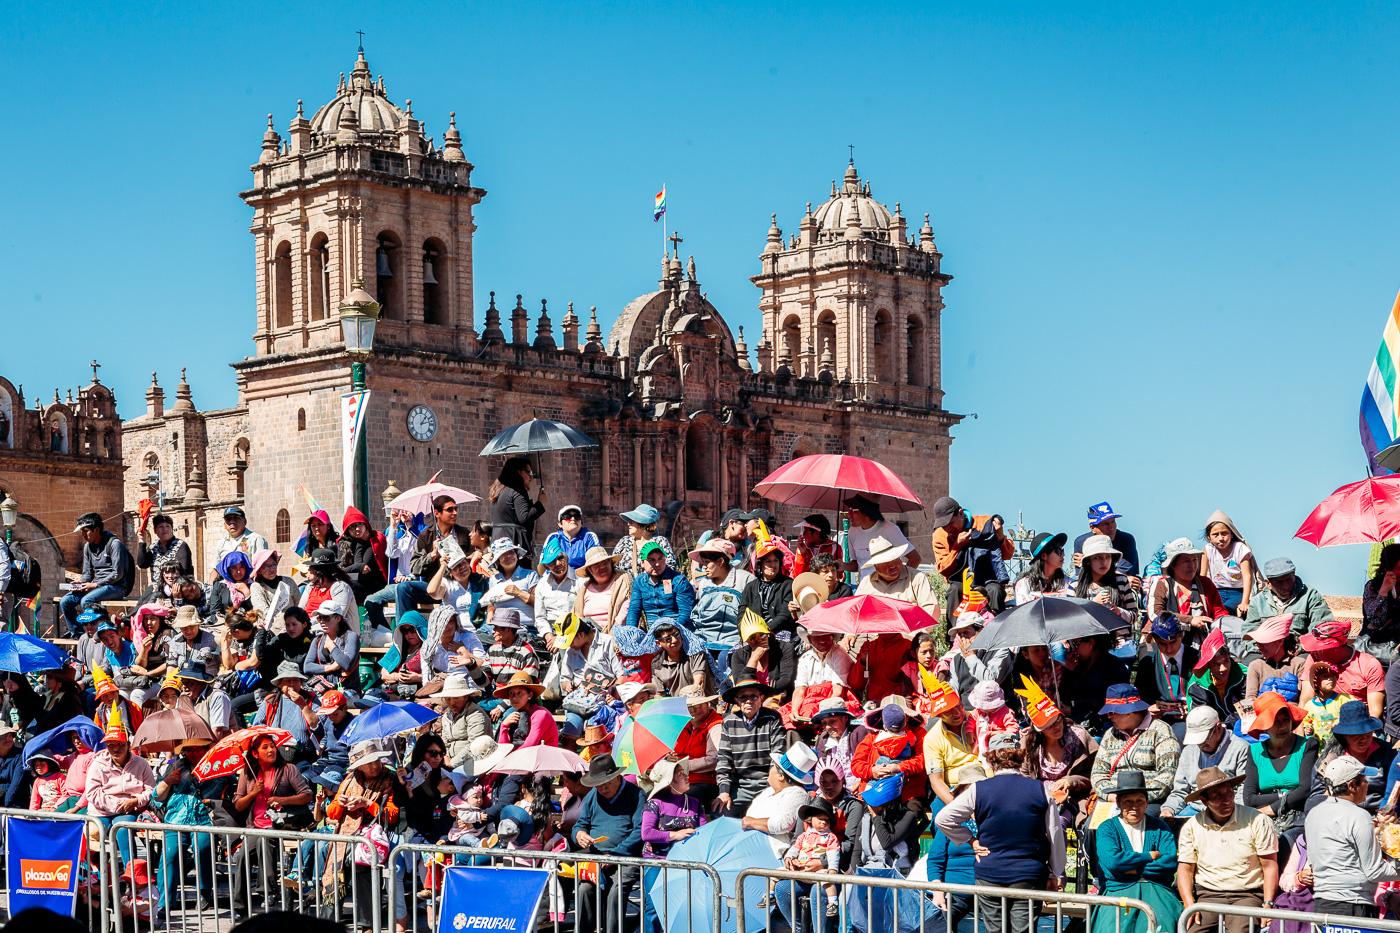 Cusco Inti Raymi Festival -82- June 2015